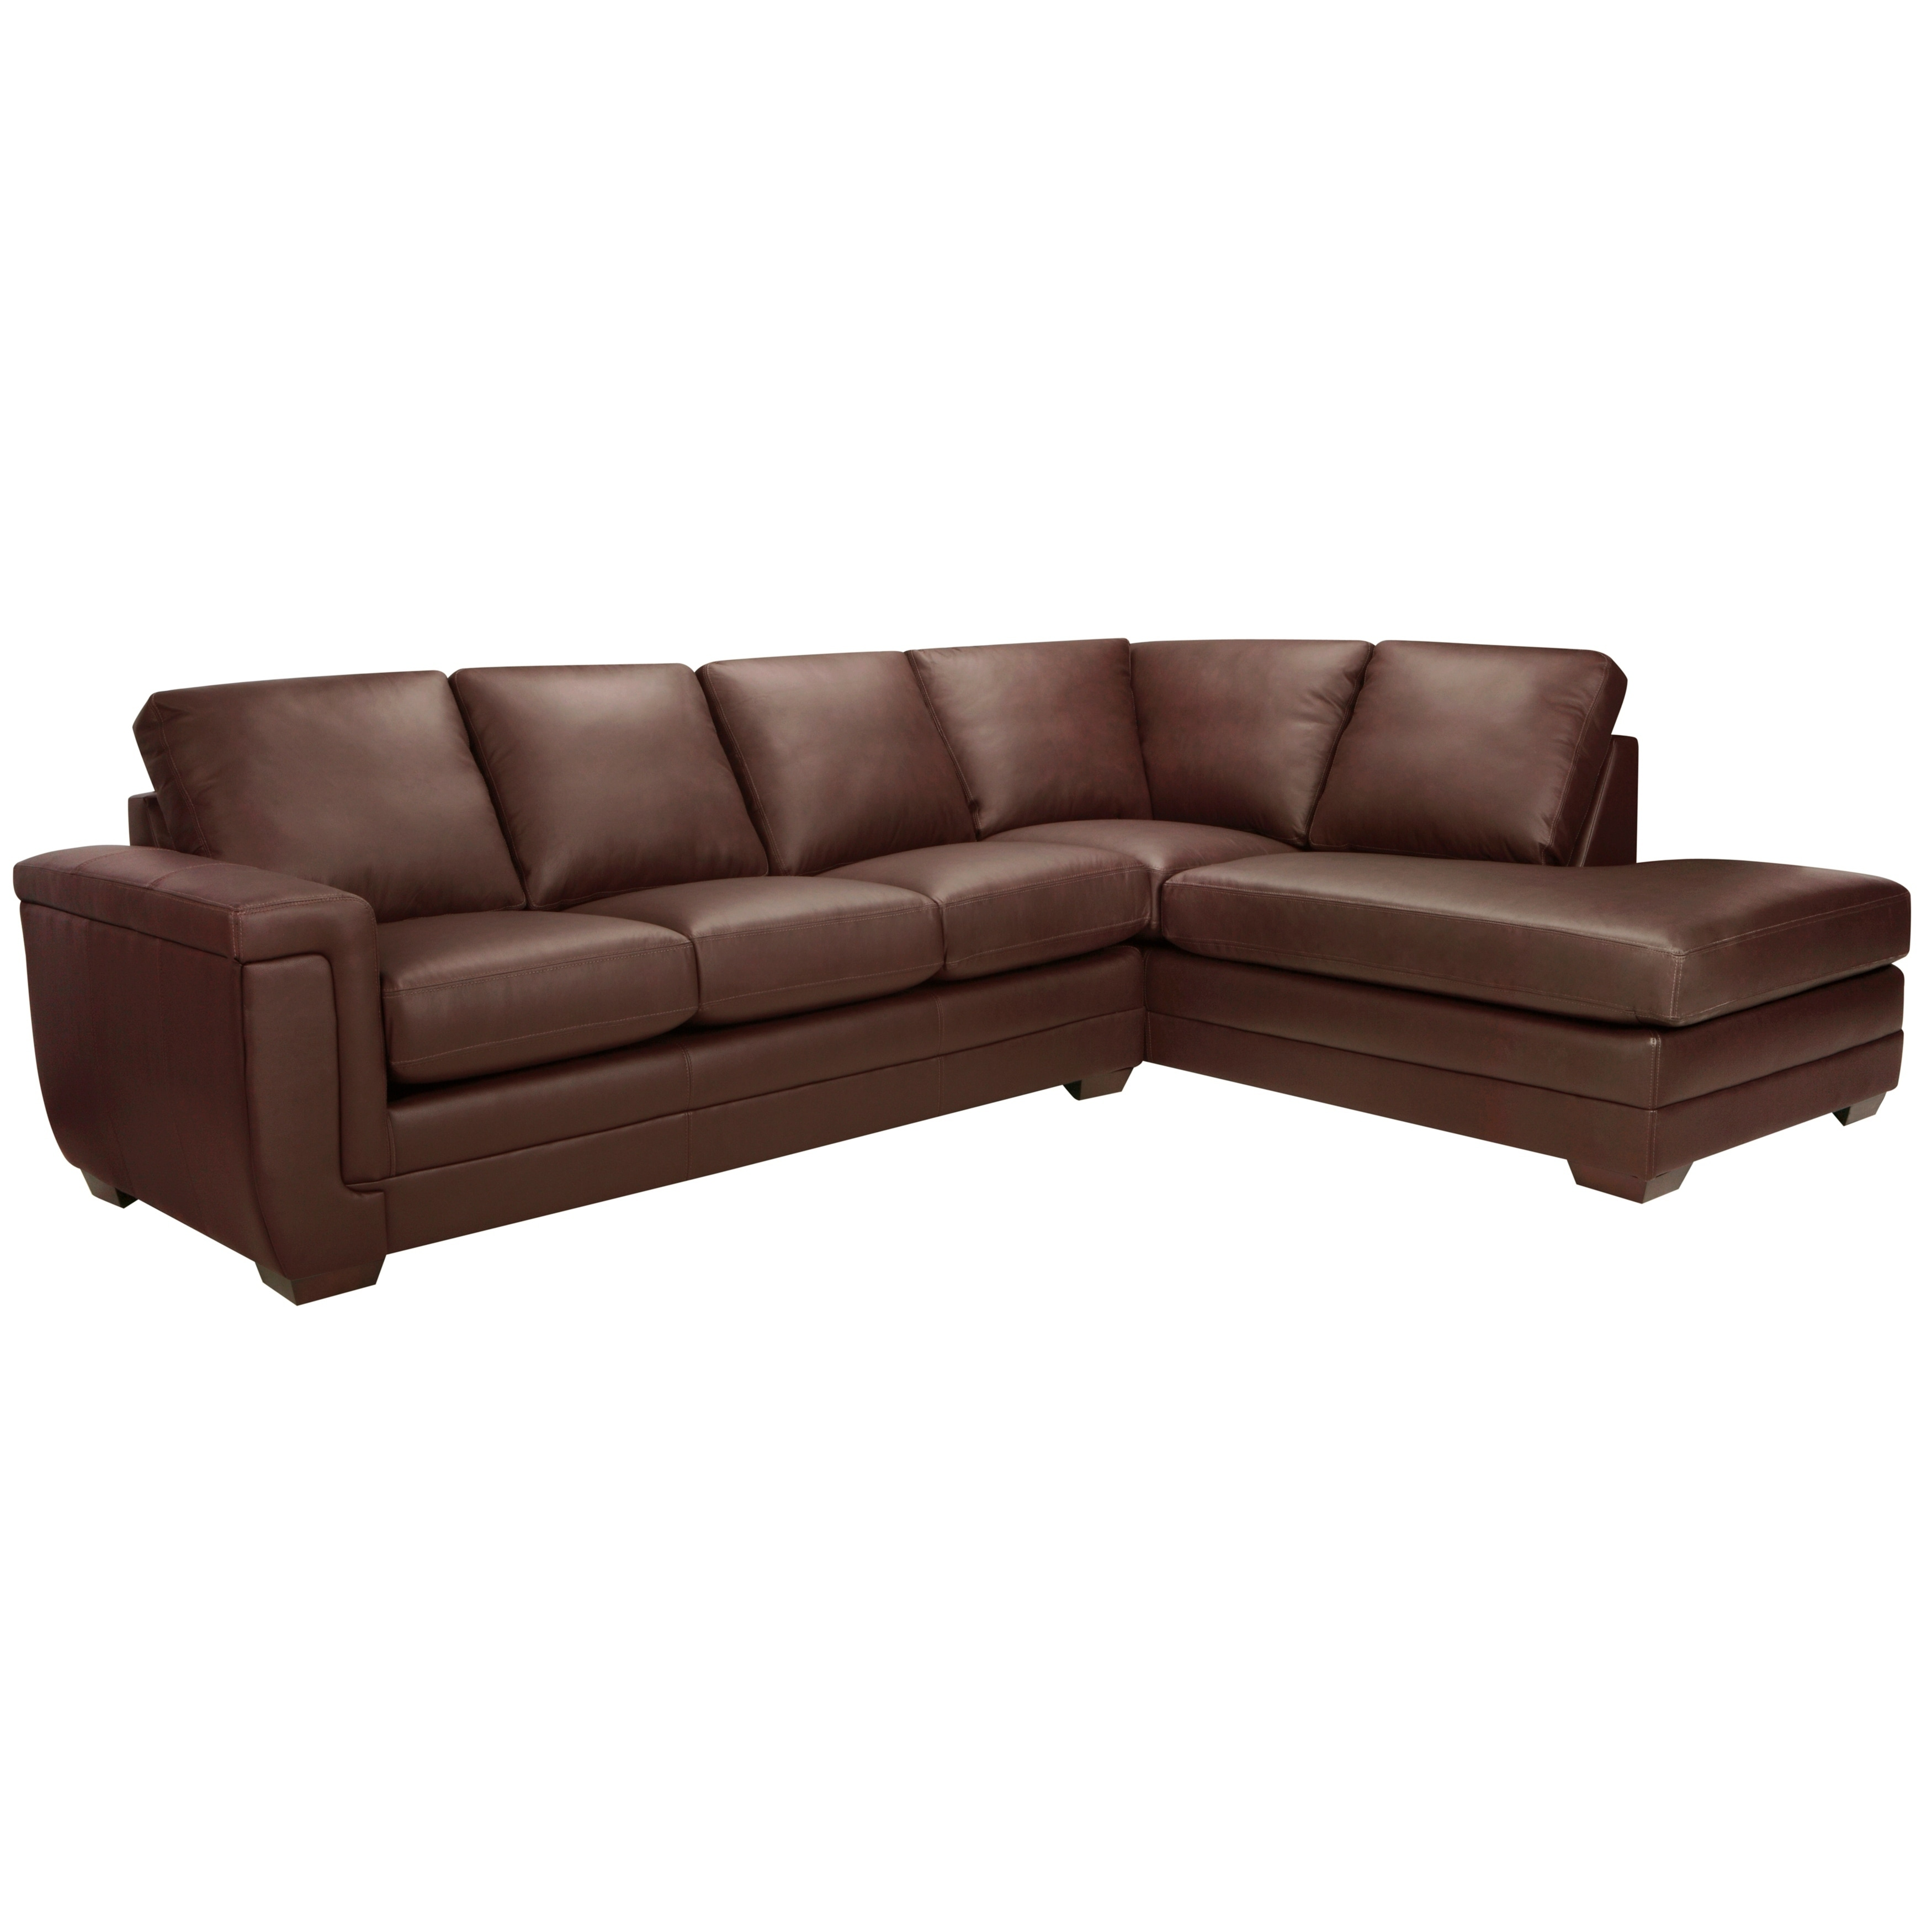 porsche top grain italian leather sectional sofa 36 5 x 116 x 37